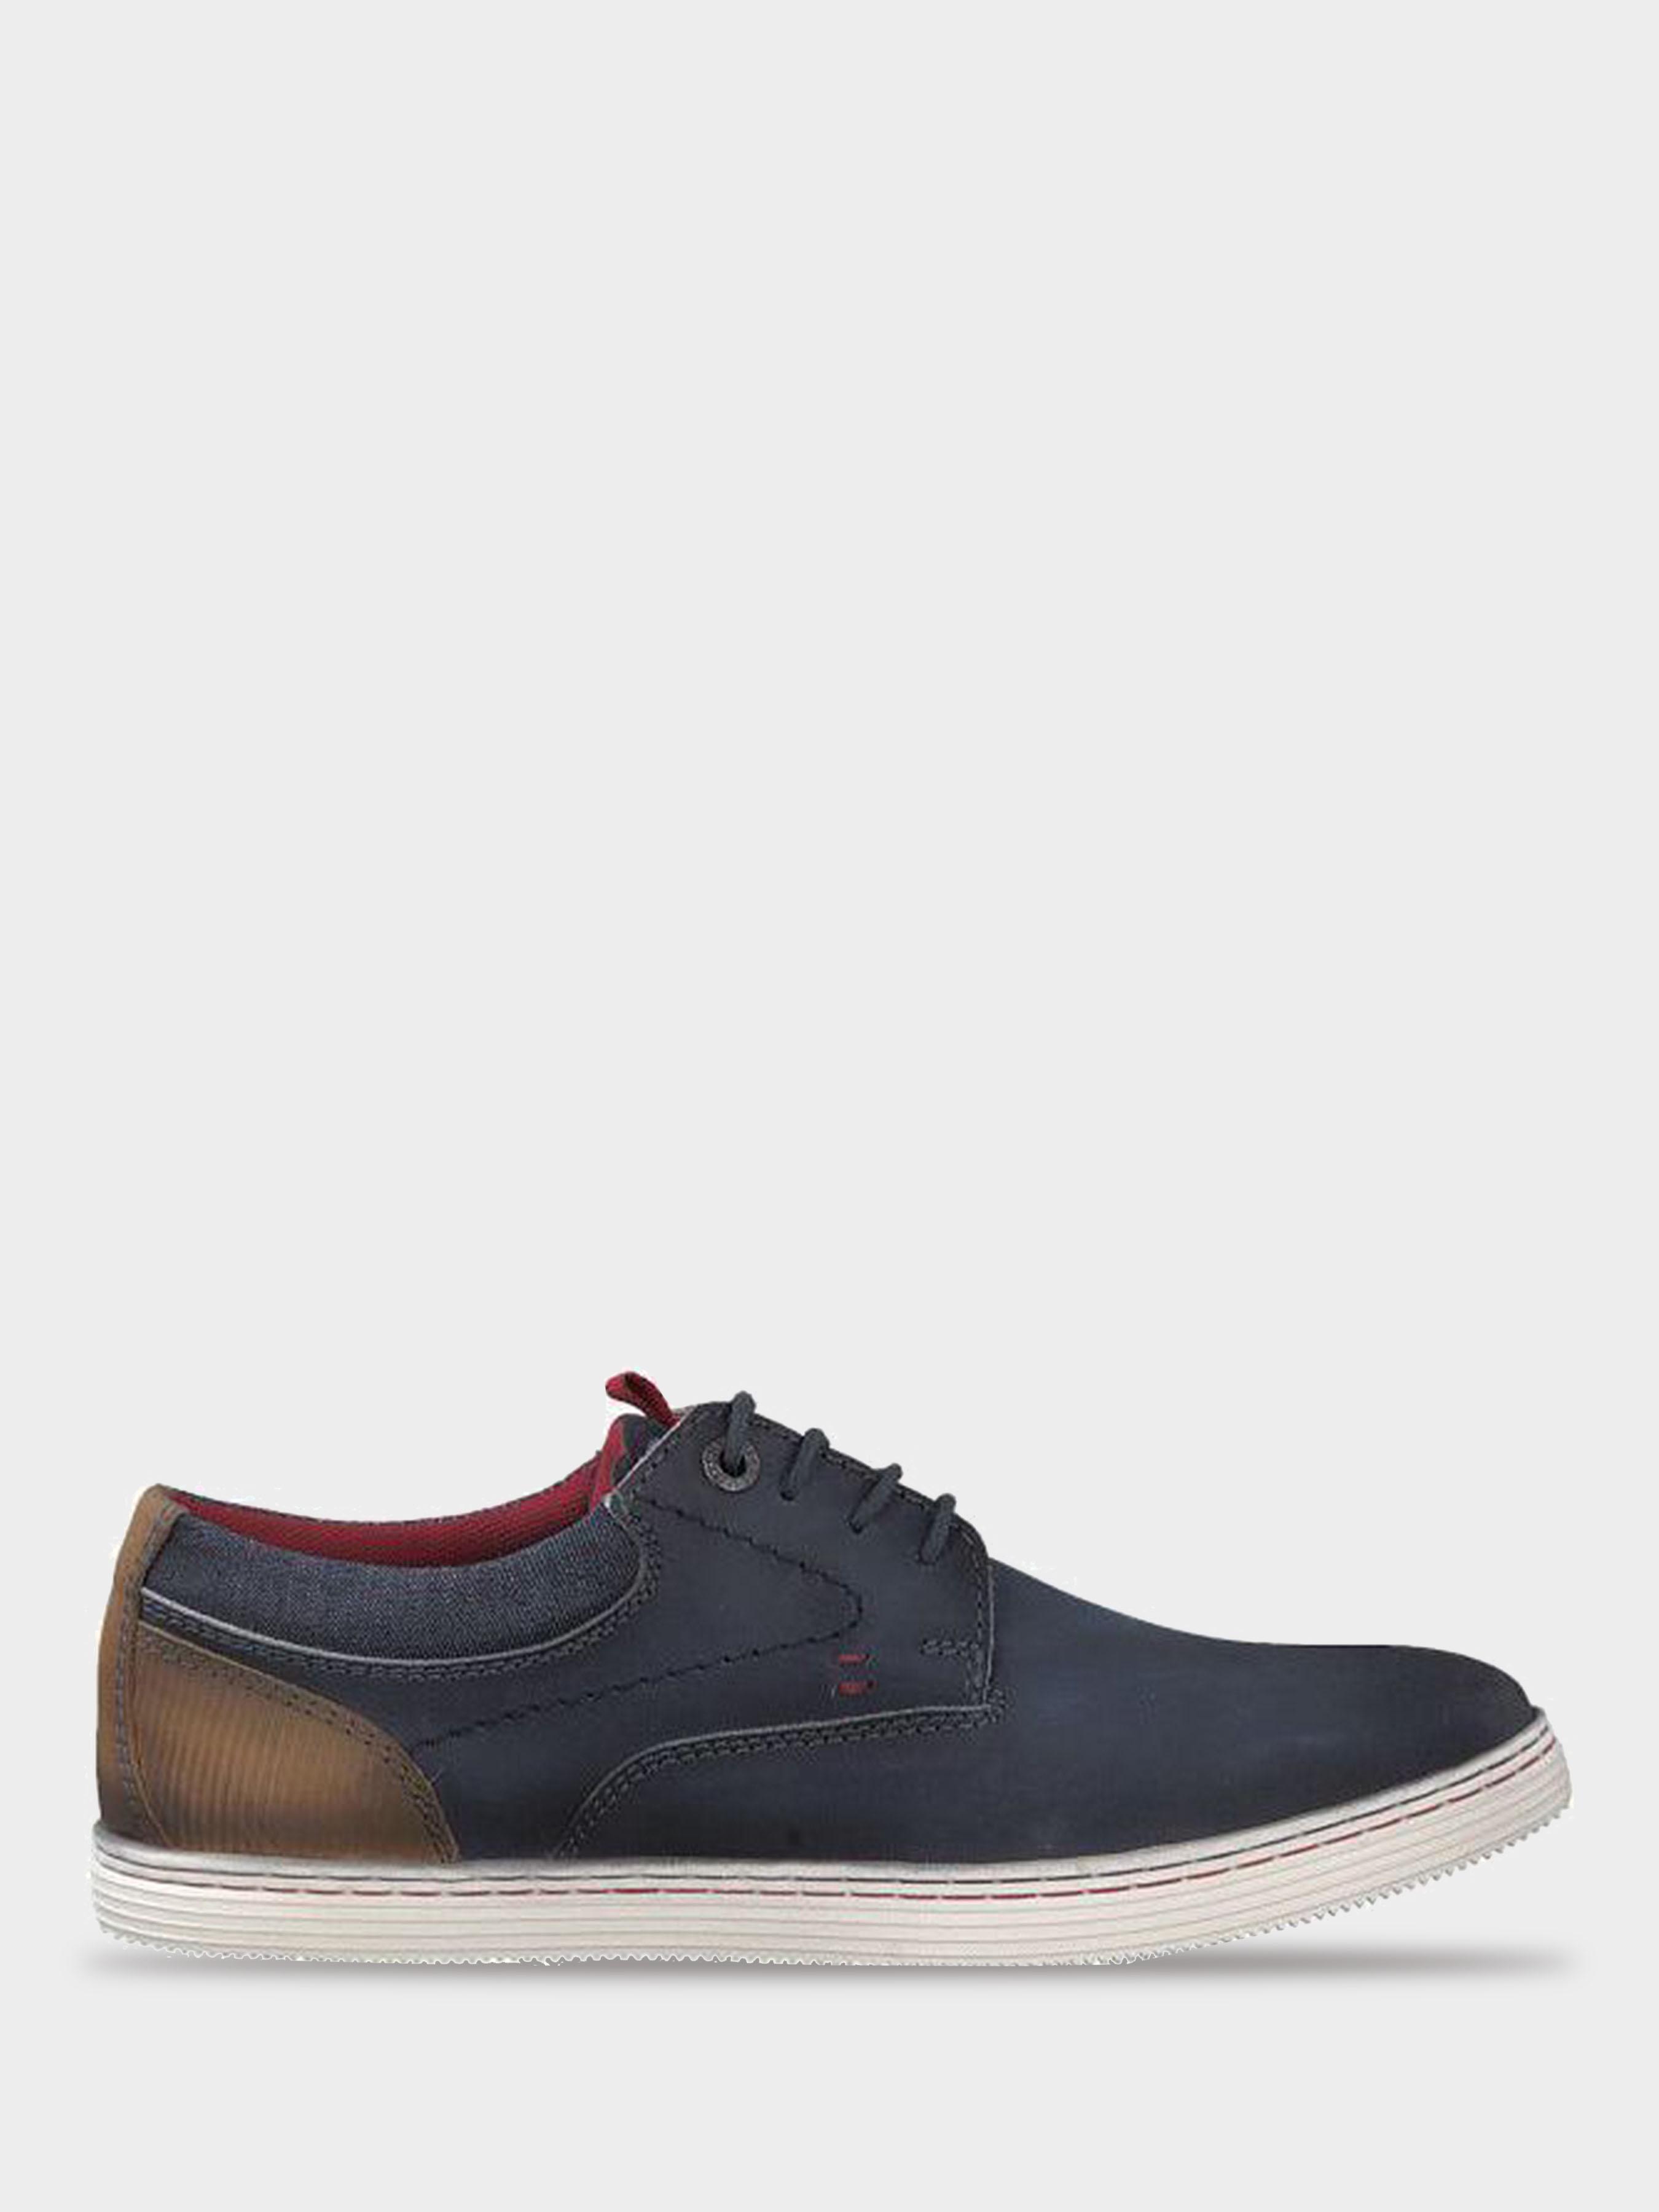 Полуботинки для мужчин S.Oliver 5M1 размеры обуви, 2017